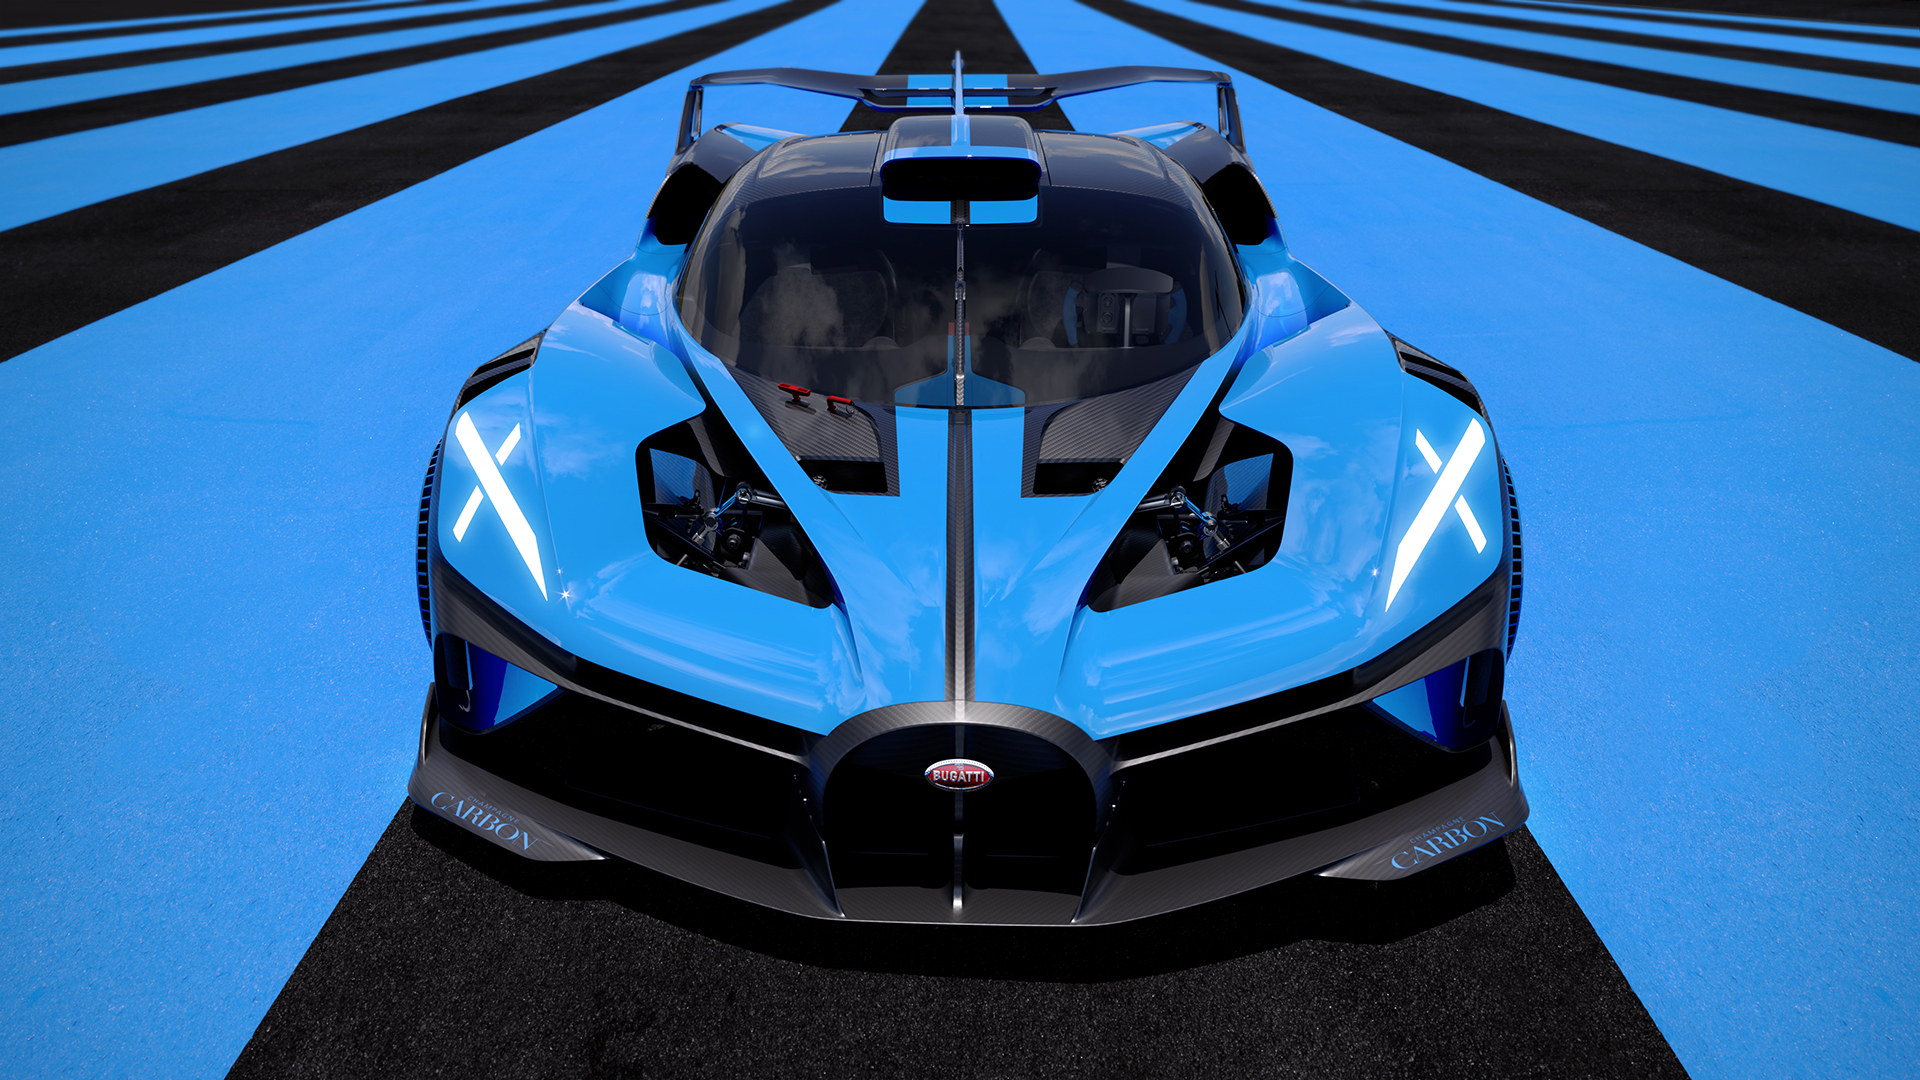 Bugatti Bolide hypercar breaks cover and breaks the internet